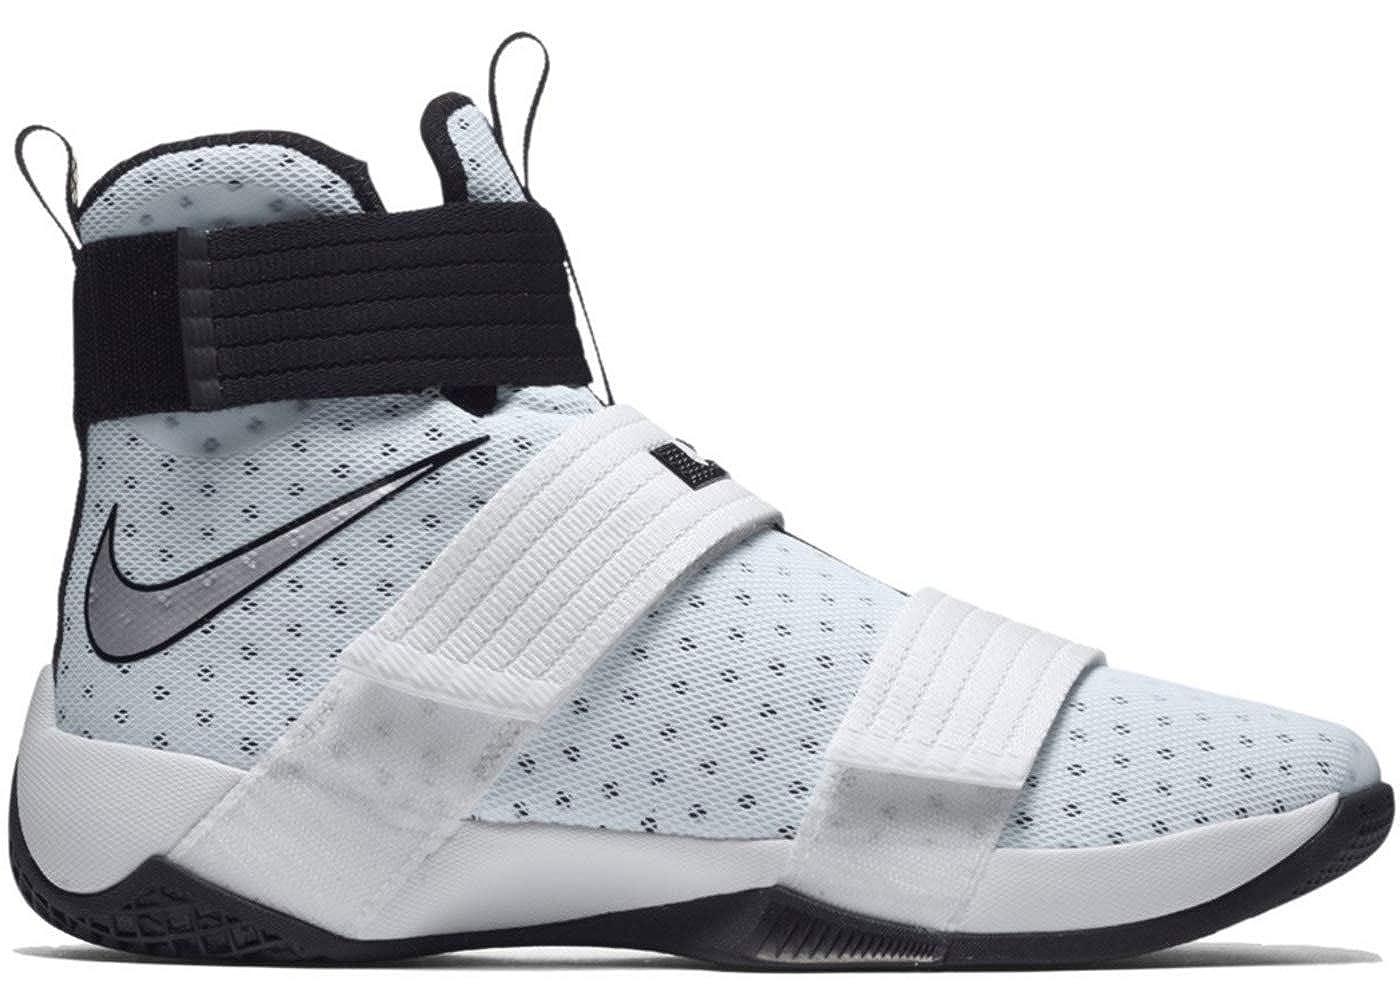 Casting sweaty sneakers 3 i